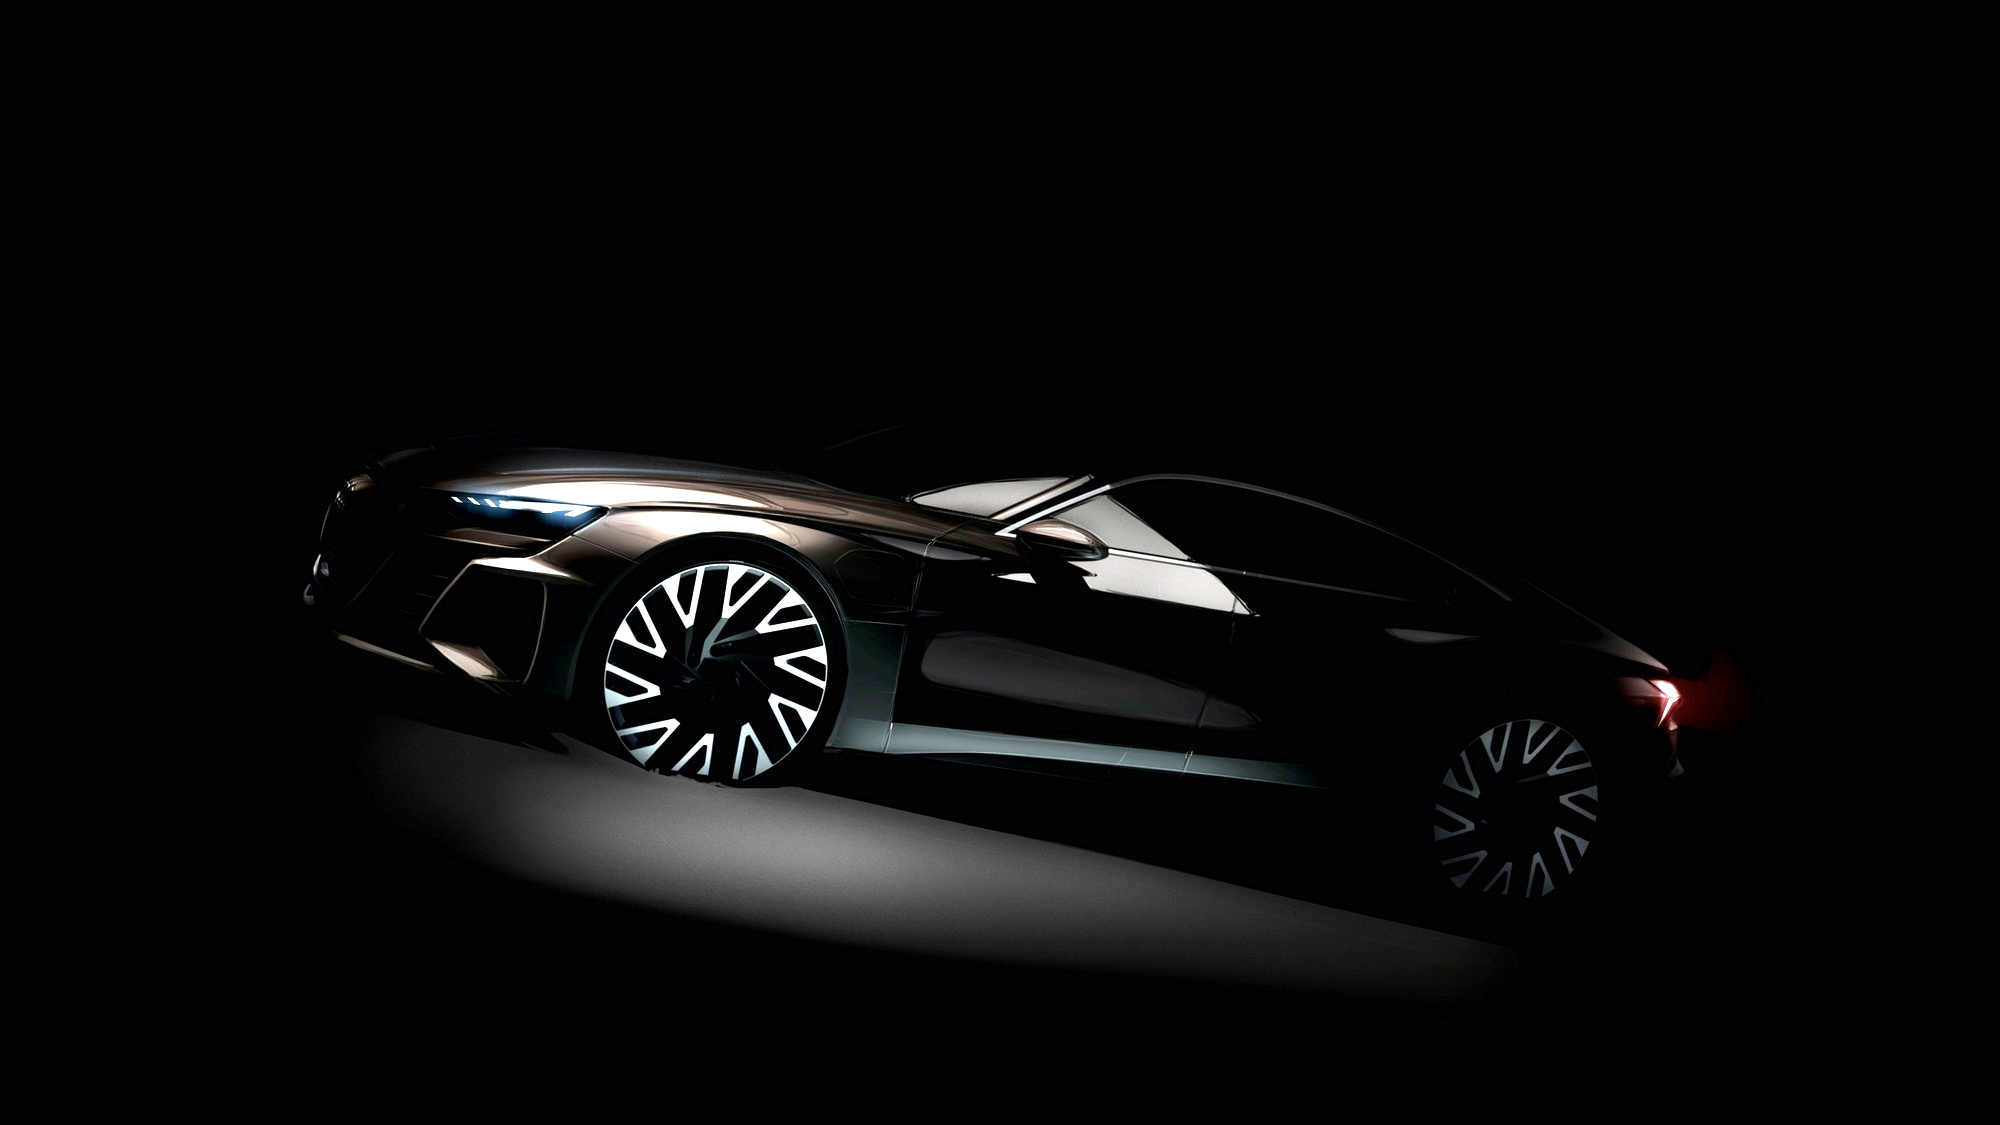 Ауди разработает 4-дверный электрокар e-tron Gran Turismo